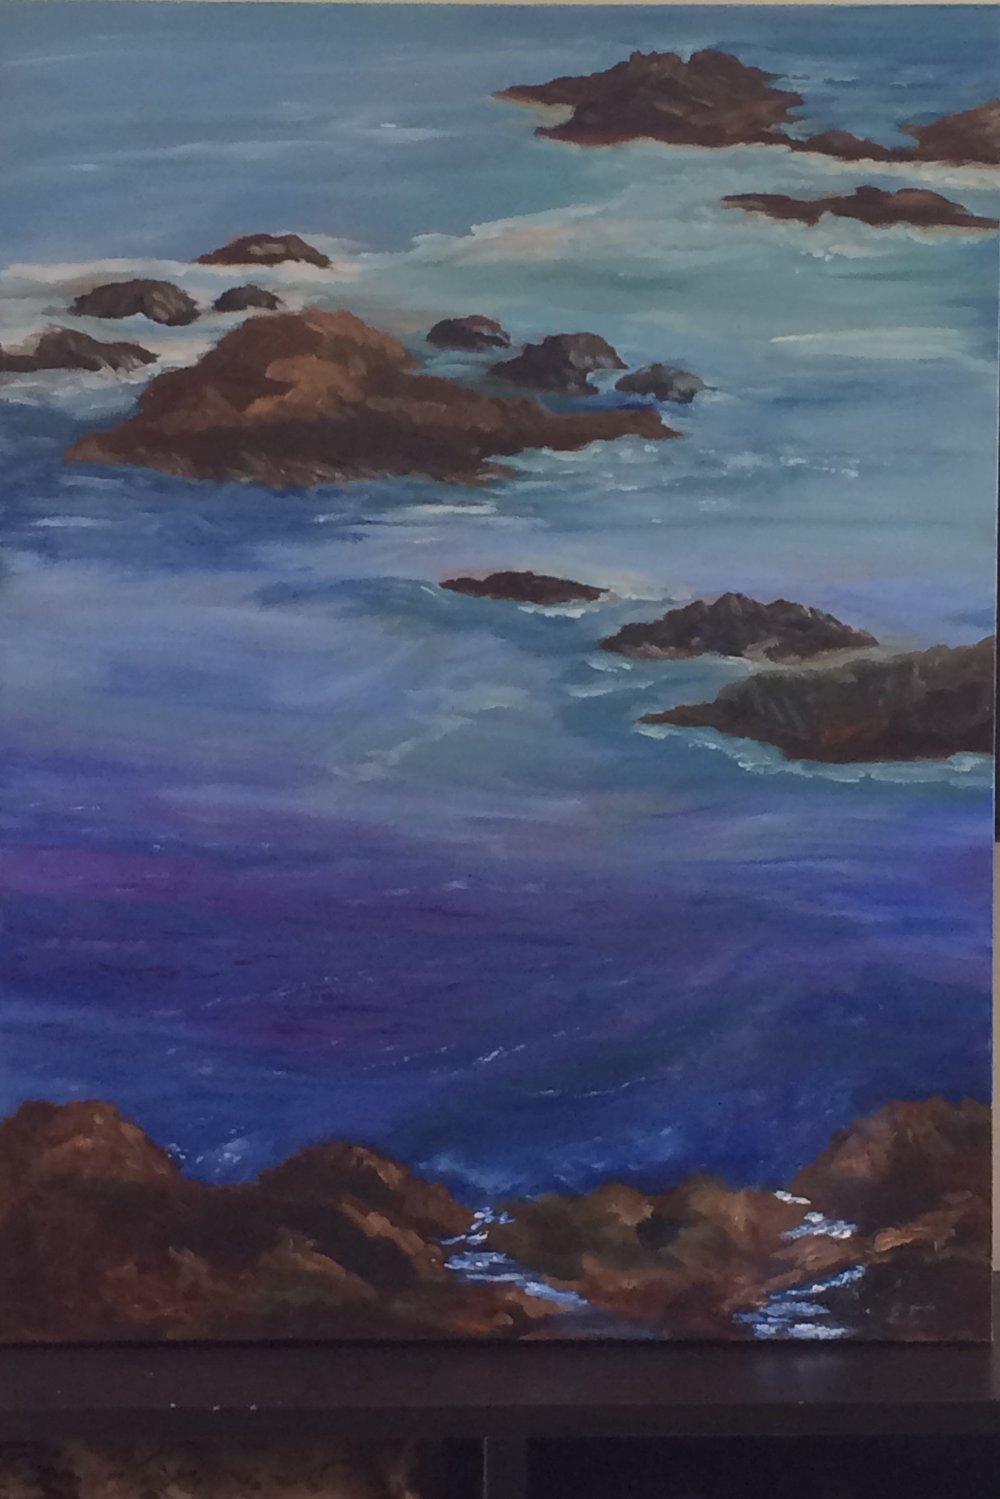 Camilke's Ocean View